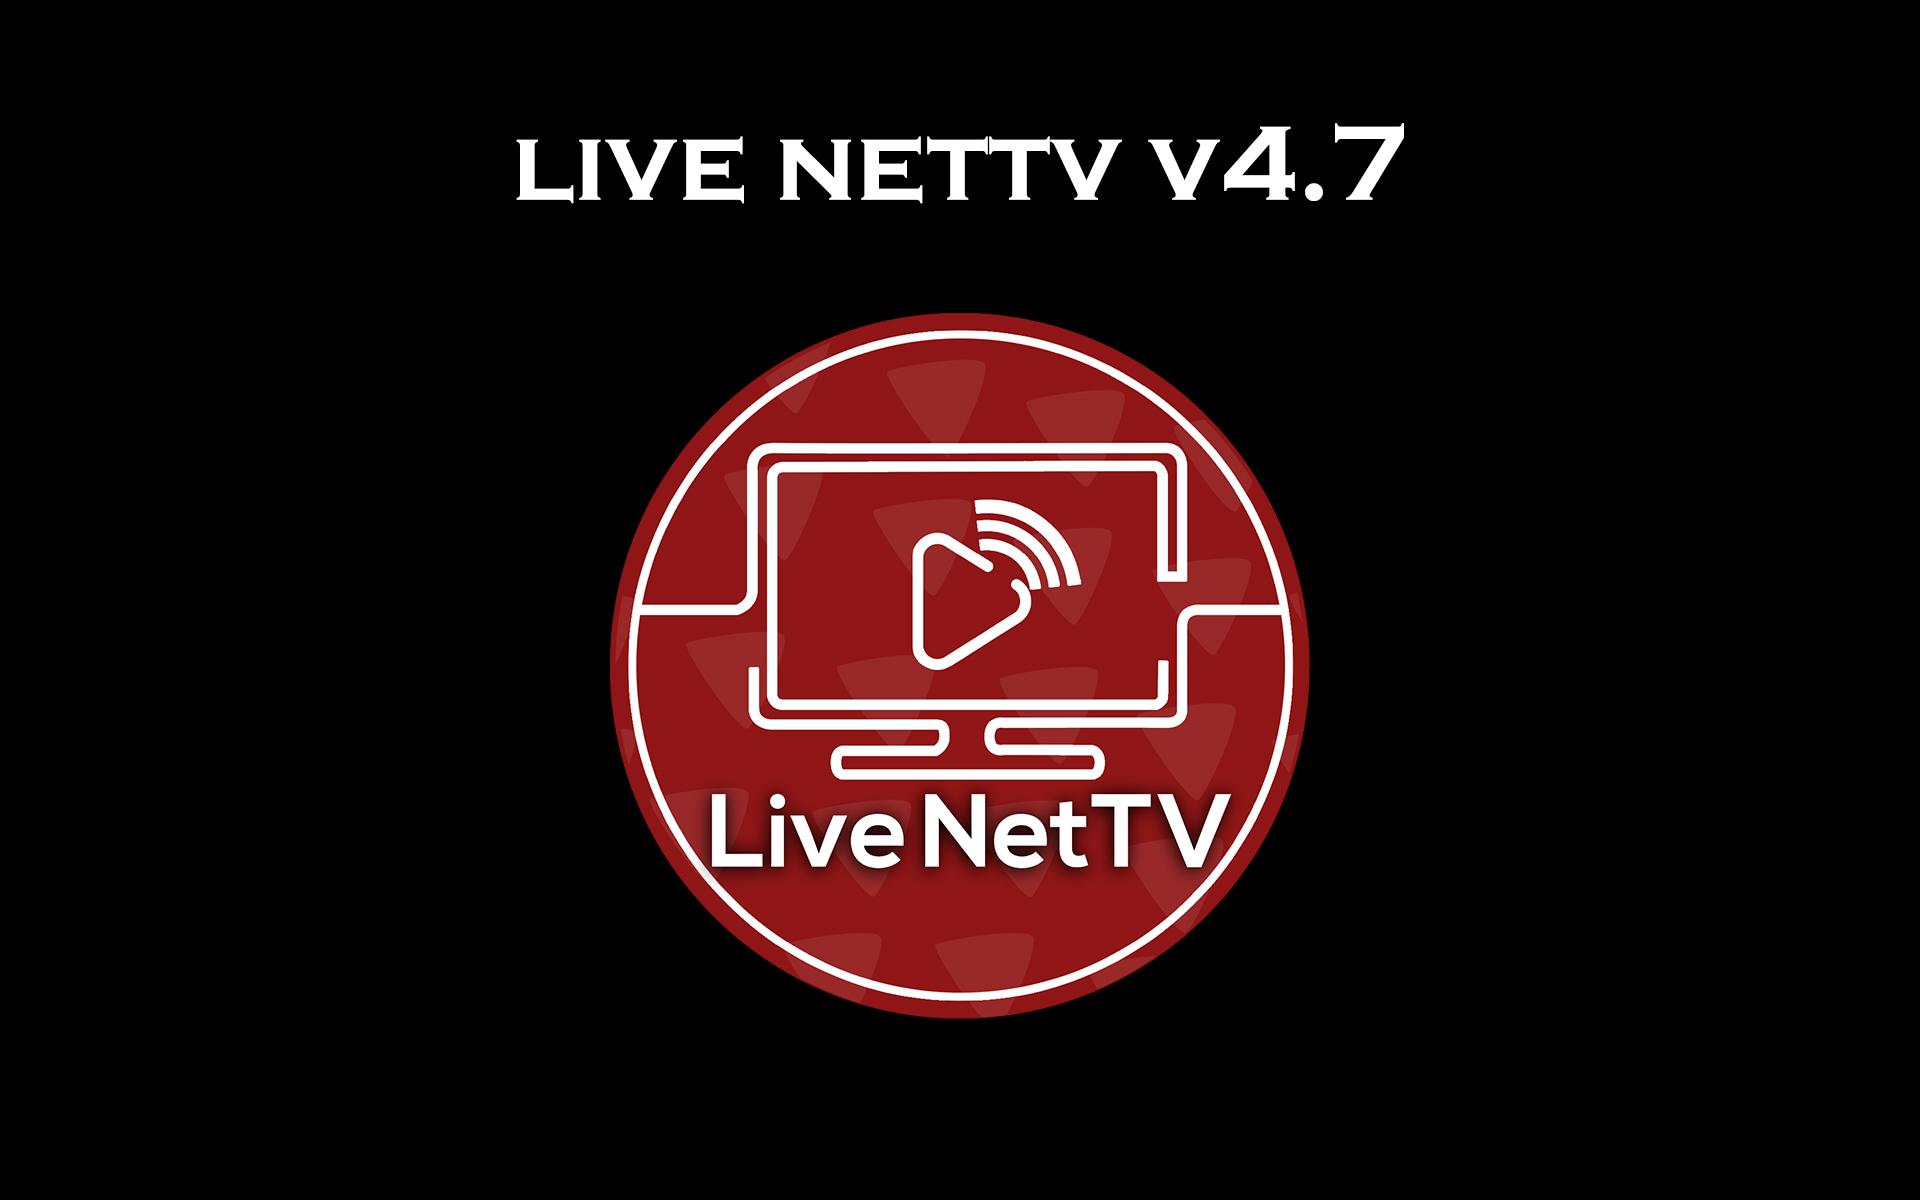 live nettv apk 4.7 download